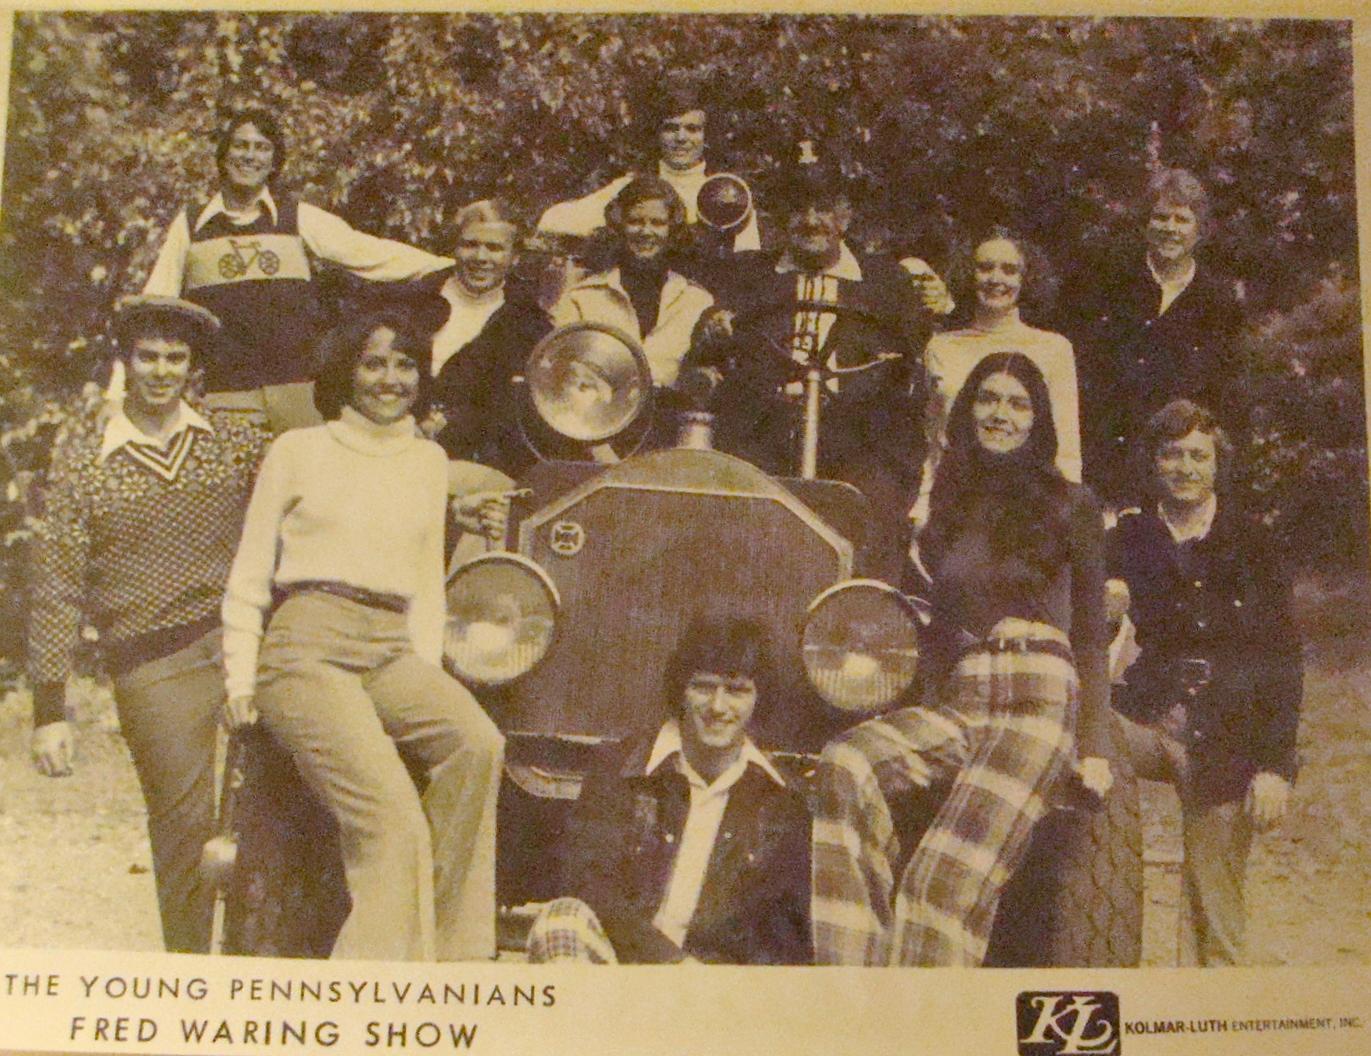 Len Young Pennsylvanians